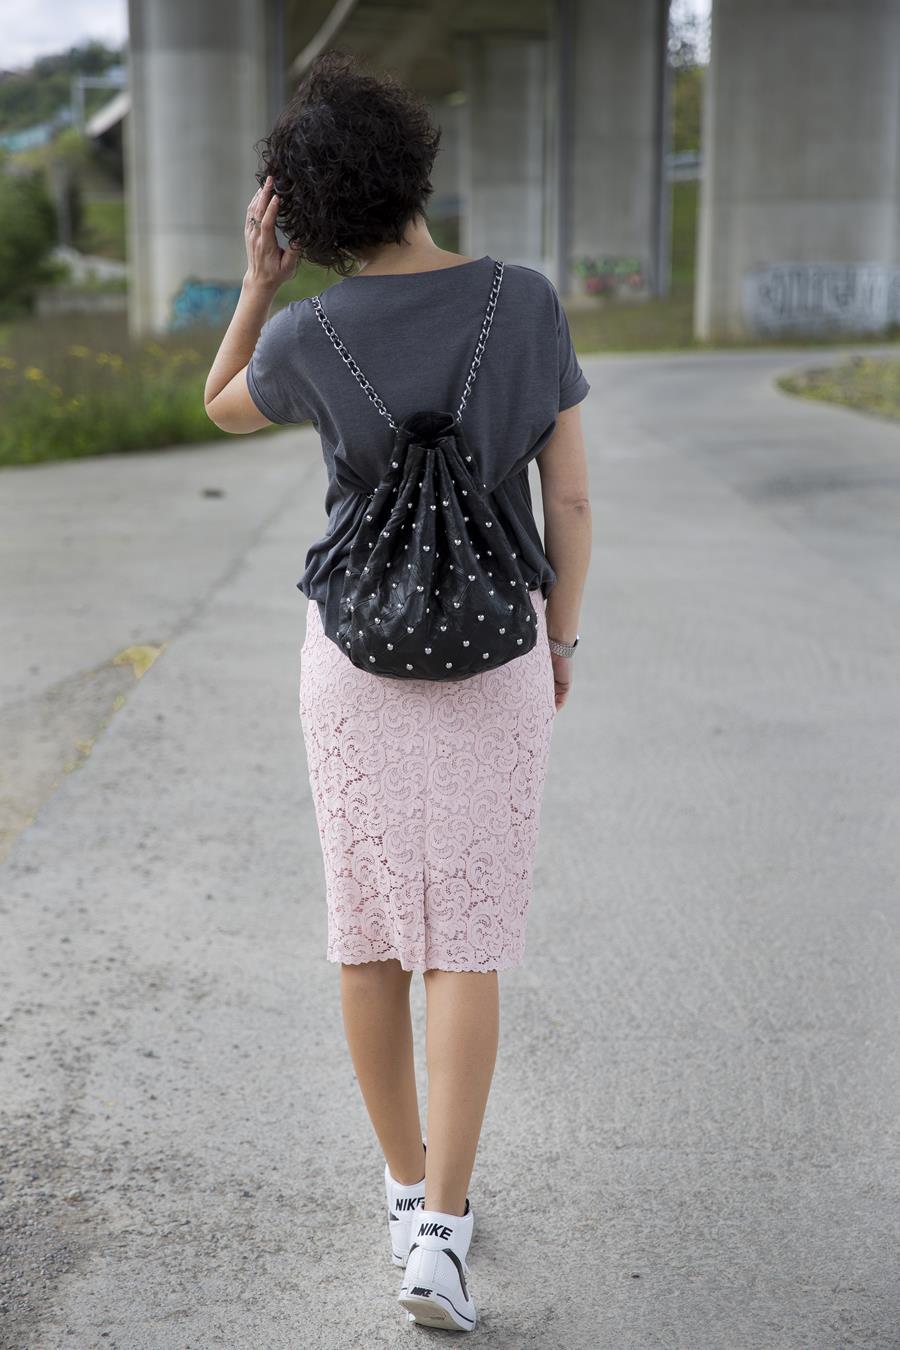 Shirt, camiseta, lady skirt, falda lapiz, falda encaje, zapatillas bota, nike, sneakers, bag, bolso saco, tachuelas, attitude, actitud